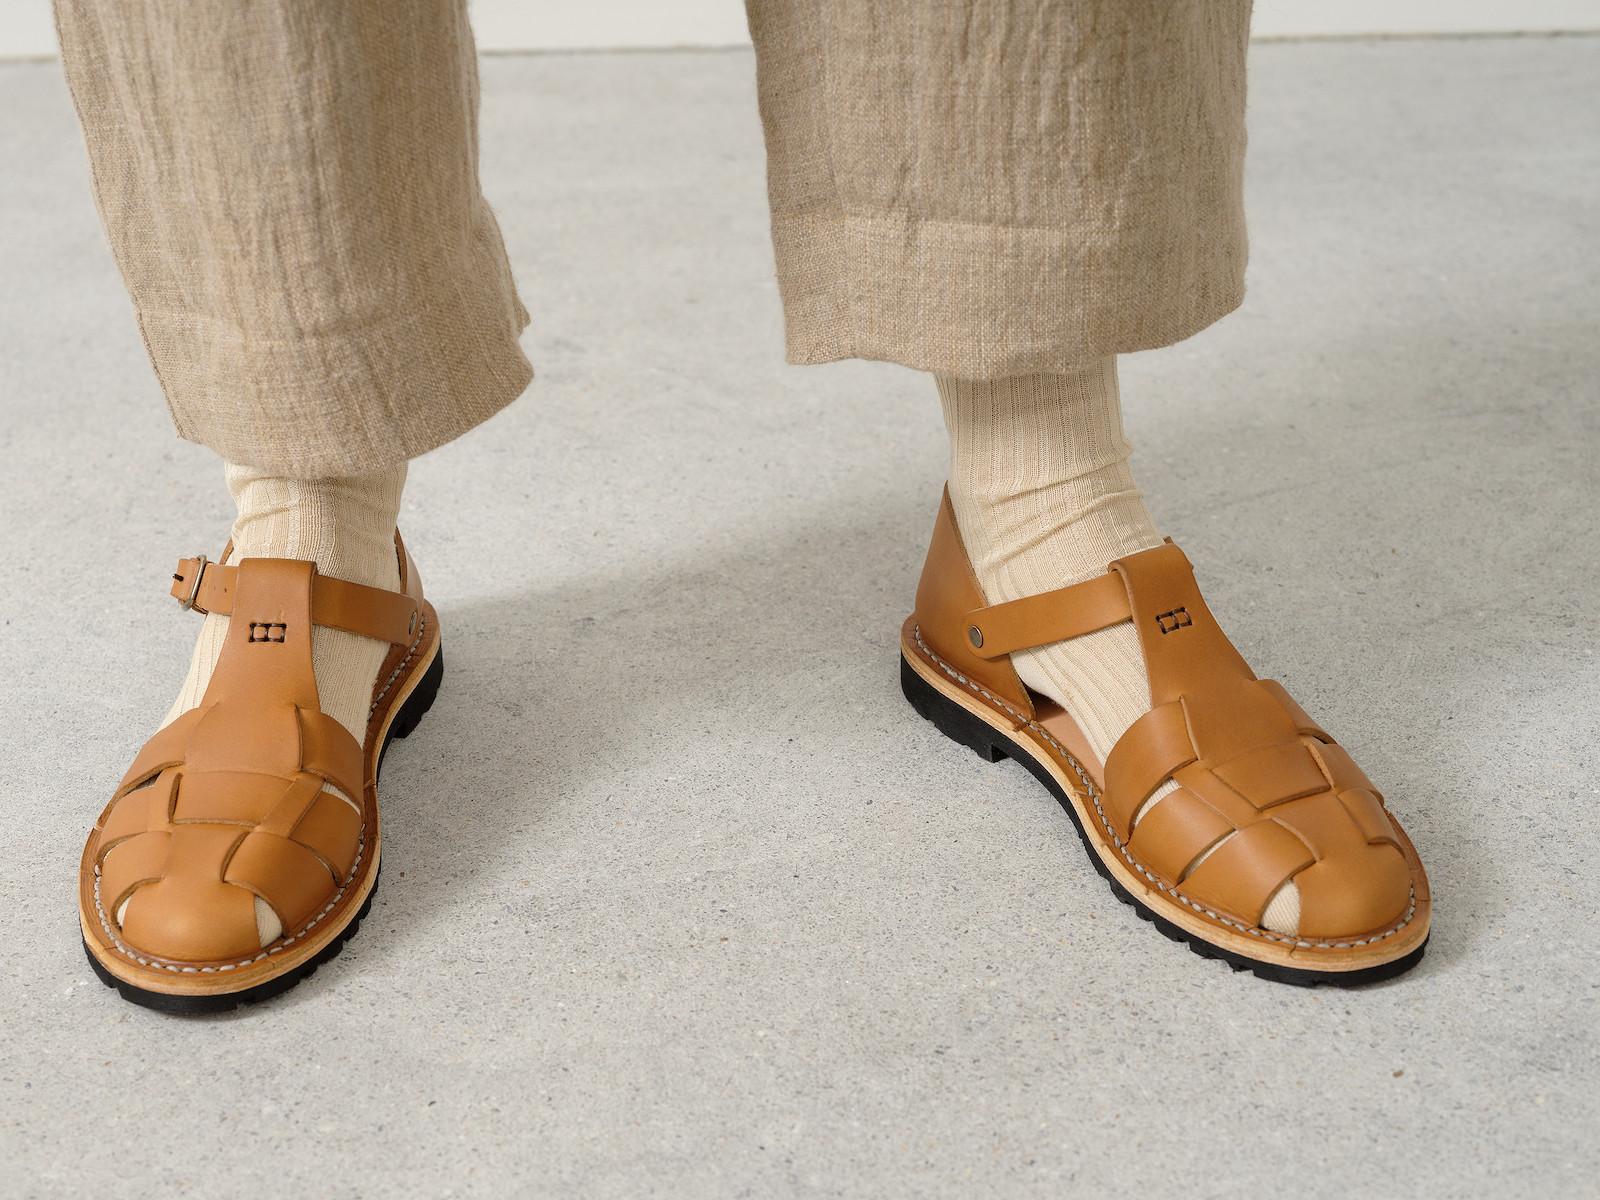 Artisanal sandals Image